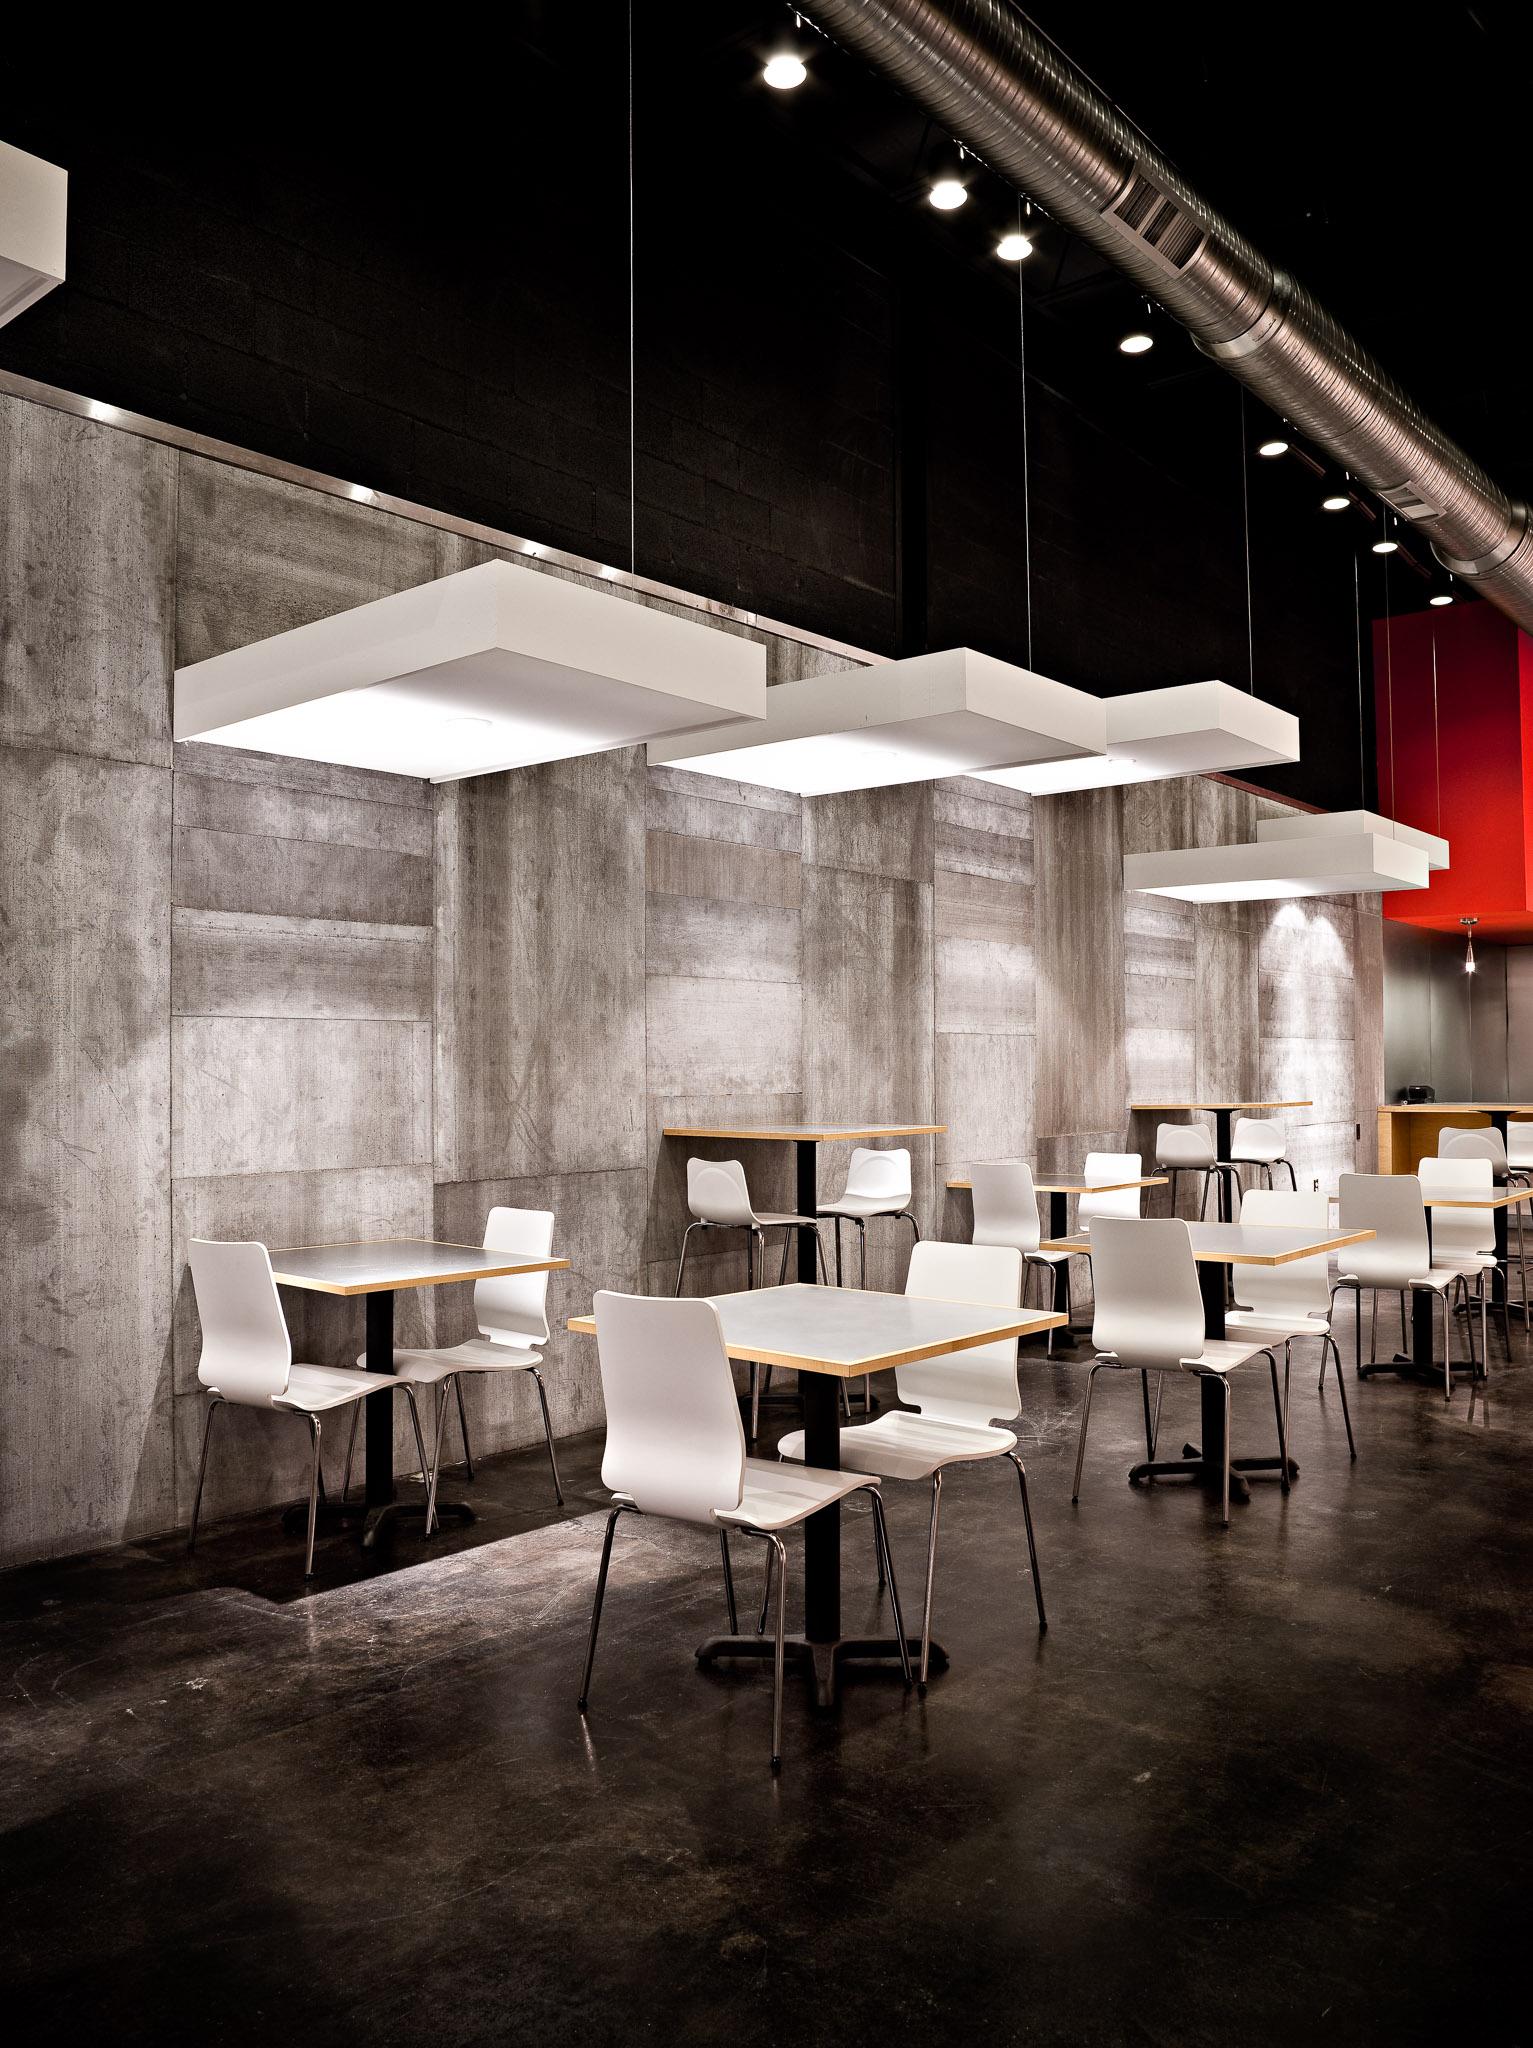 Pizza_Restaurant_int_02.jpg